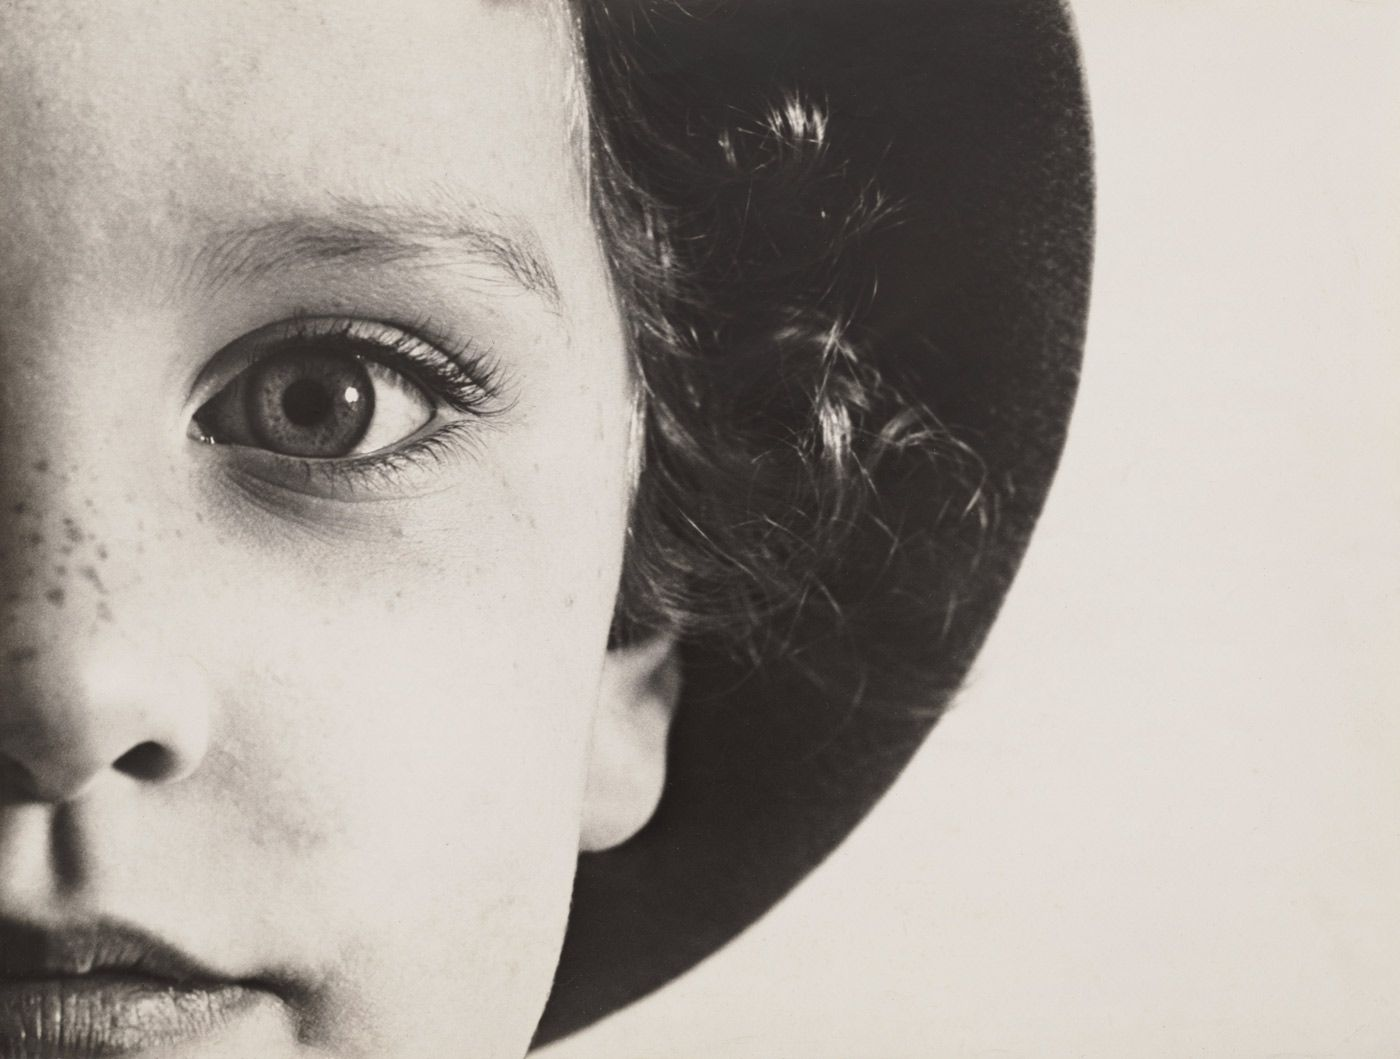 Lotte Jacobi Mit Bildern